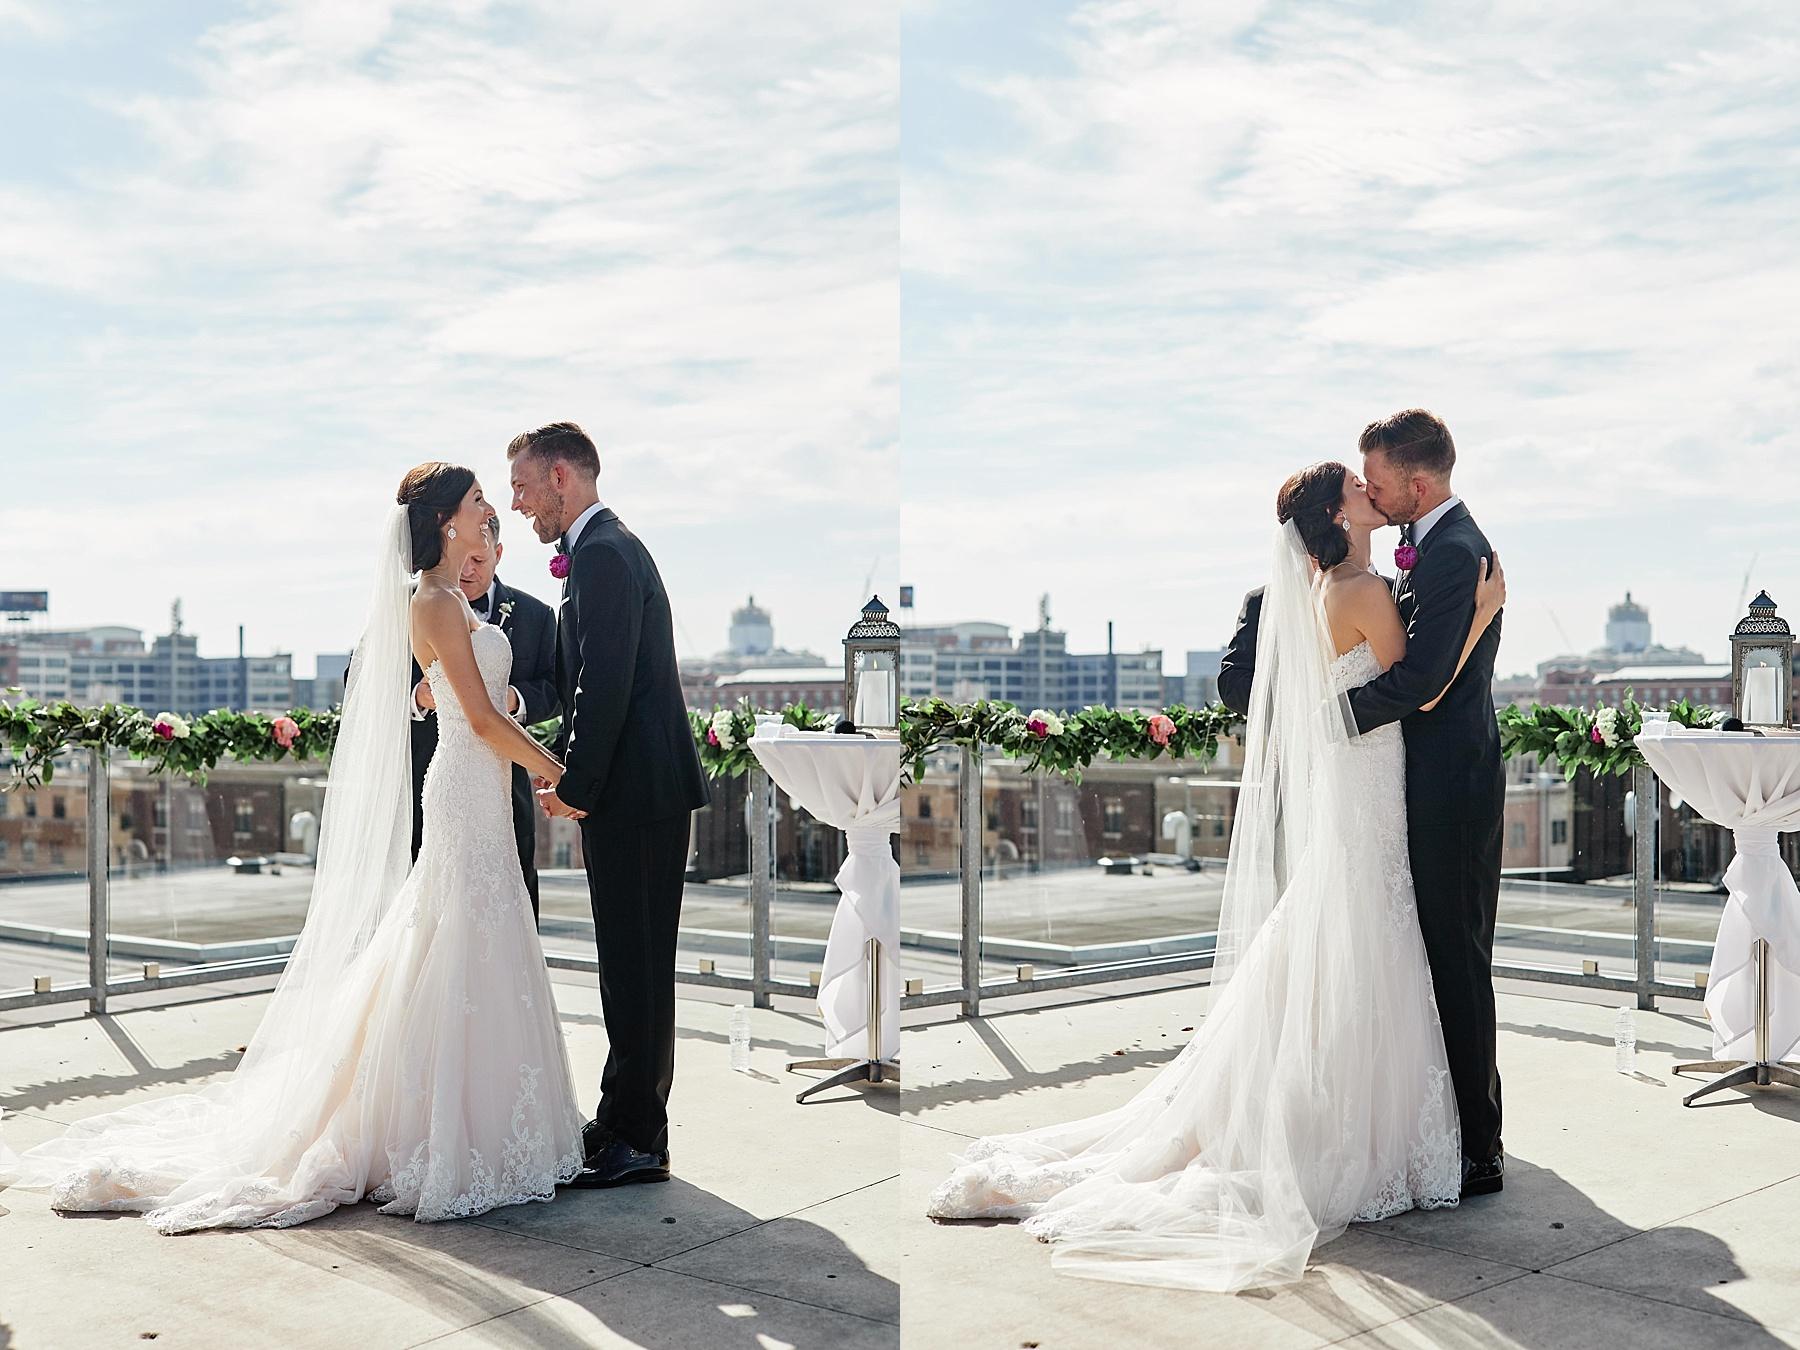 ABULAE-Wedding-Saint-paul-MN-Josh-Sofia-Wedding-Mears-Park_0773.jpg